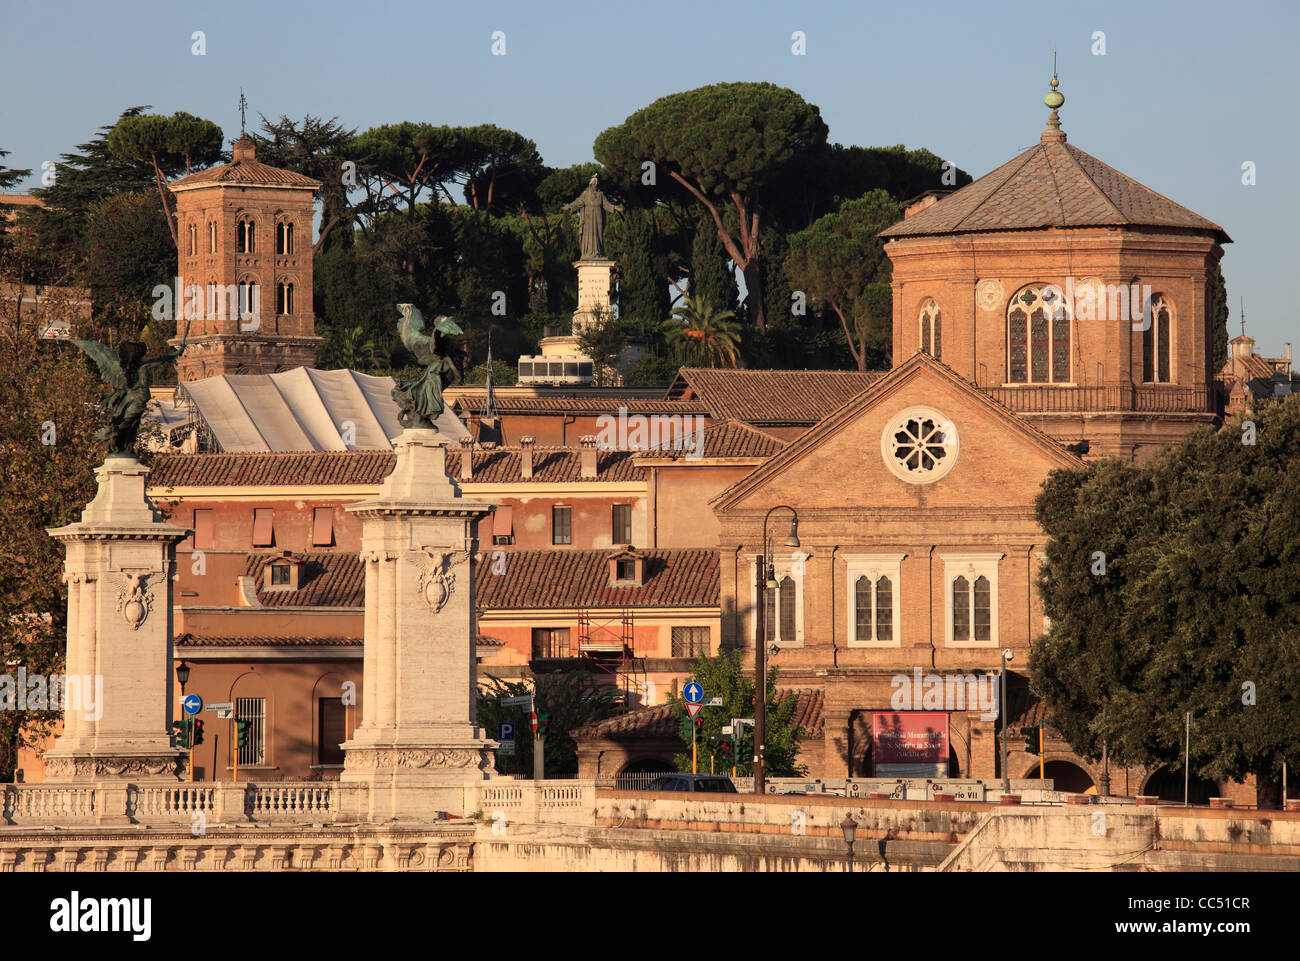 Italy, Lazio, Rome, Ospedale Santo Spirito, hospital, Vittorio Emanuele II Bridge, Stock Photo